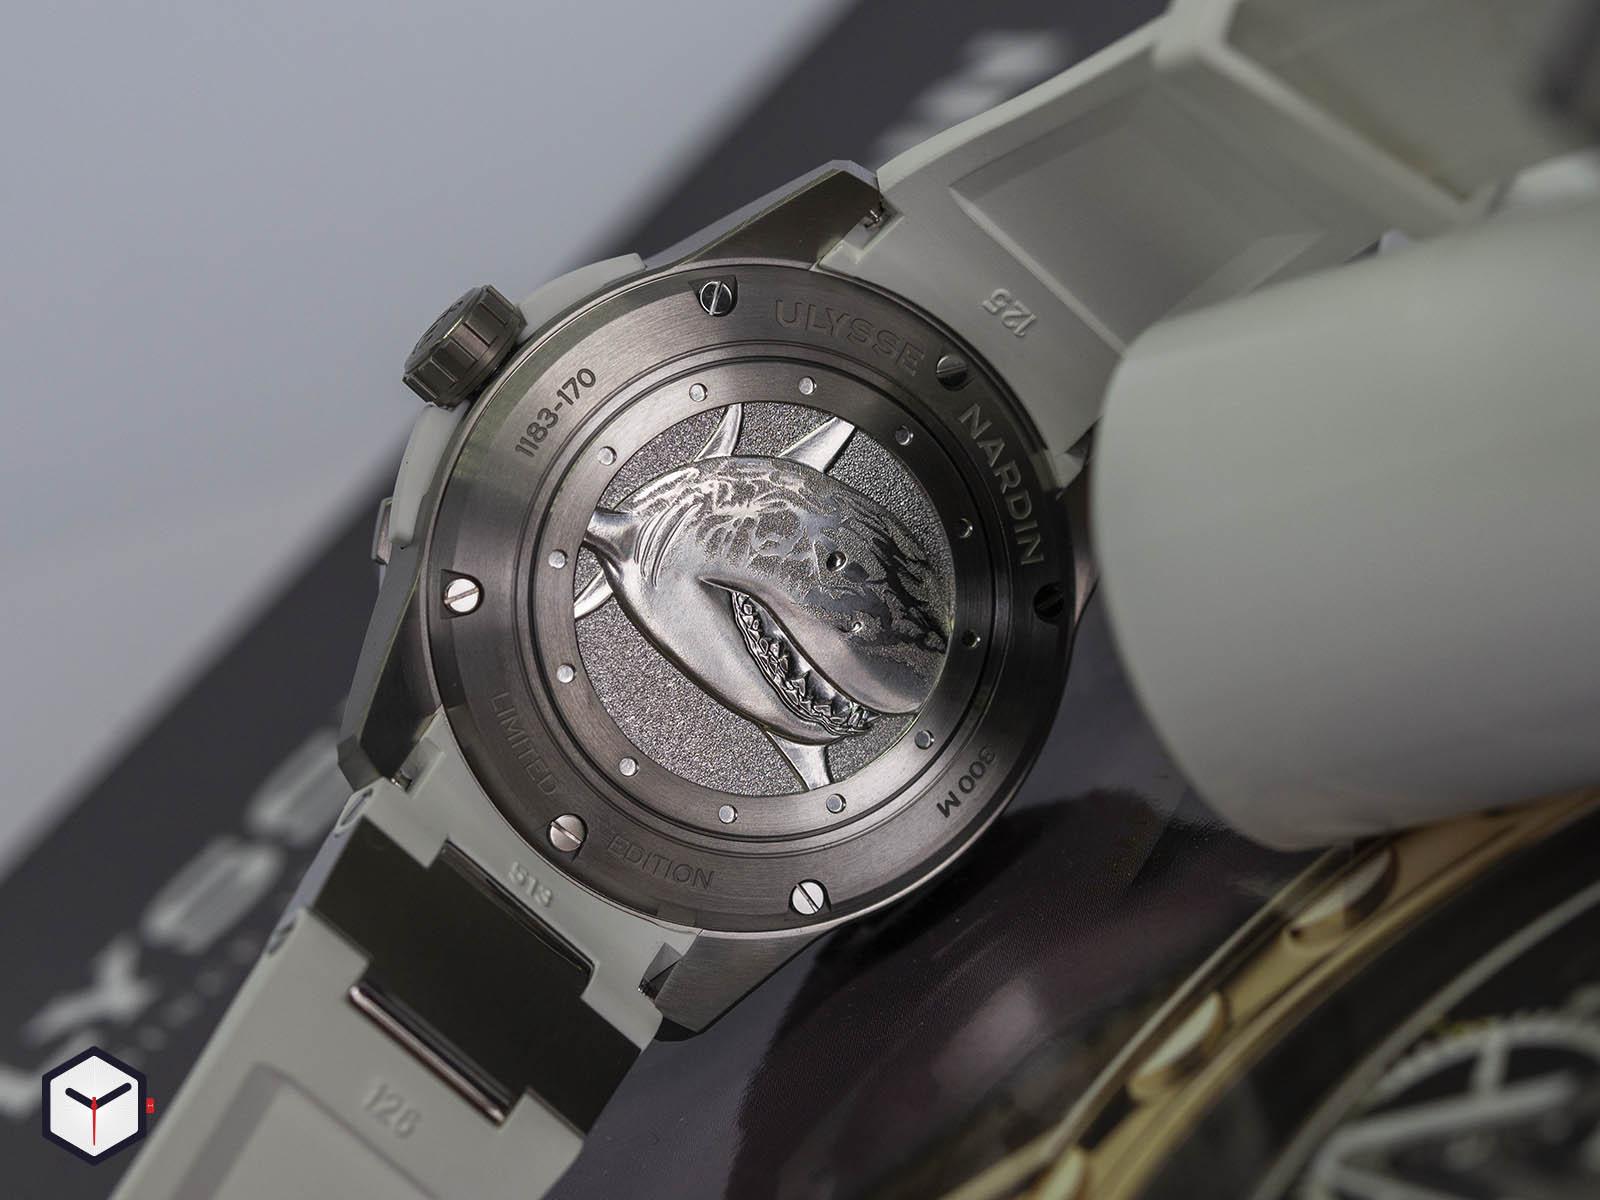 1183-170le-3-90-gw-ulysse-nardin-diver-chronometer-5.jpg